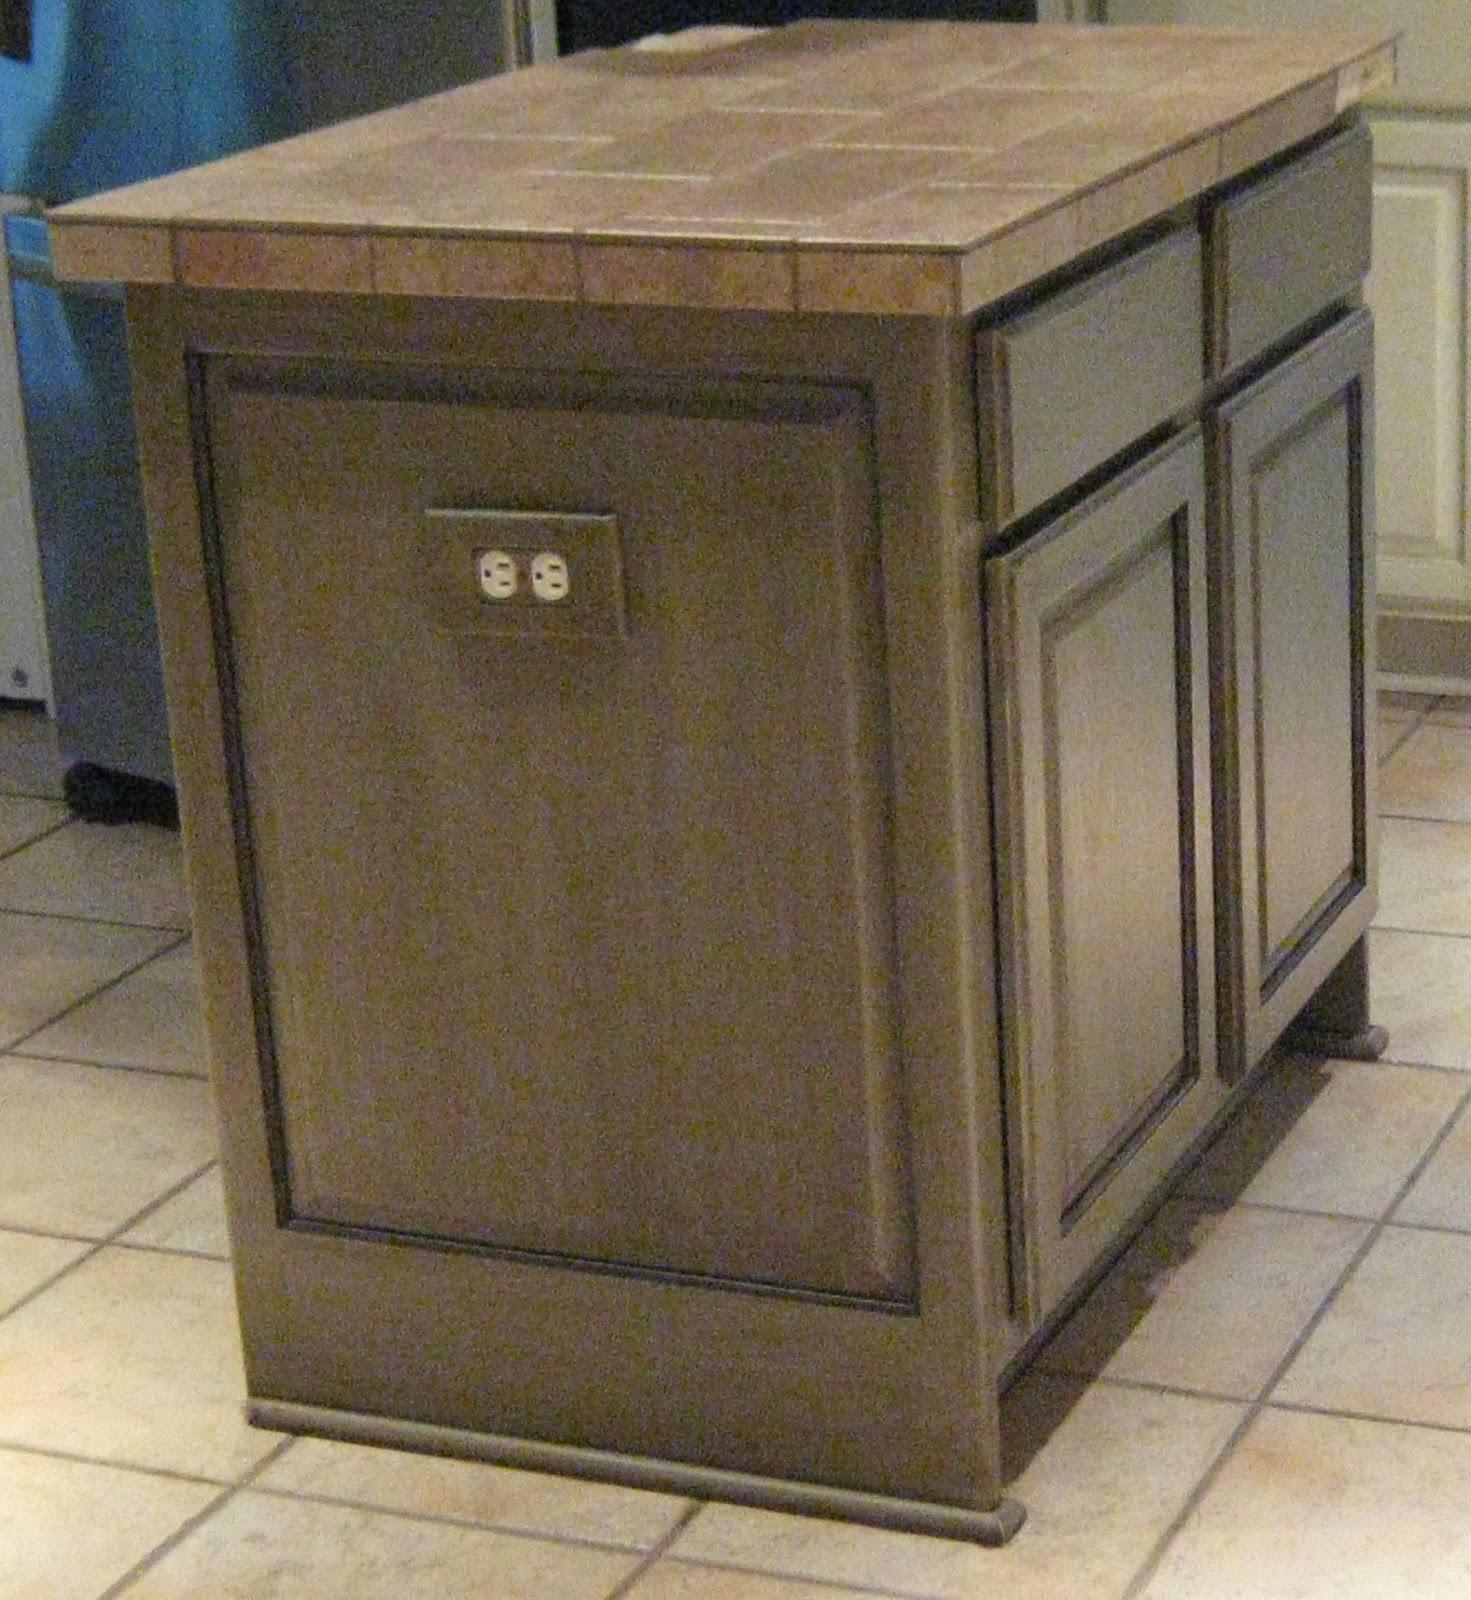 Paint Finish For Kitchen Cabinets: LYNDA BERGMAN DECORATIVE ARTISAN: PAINTING LISA & BRAD'S